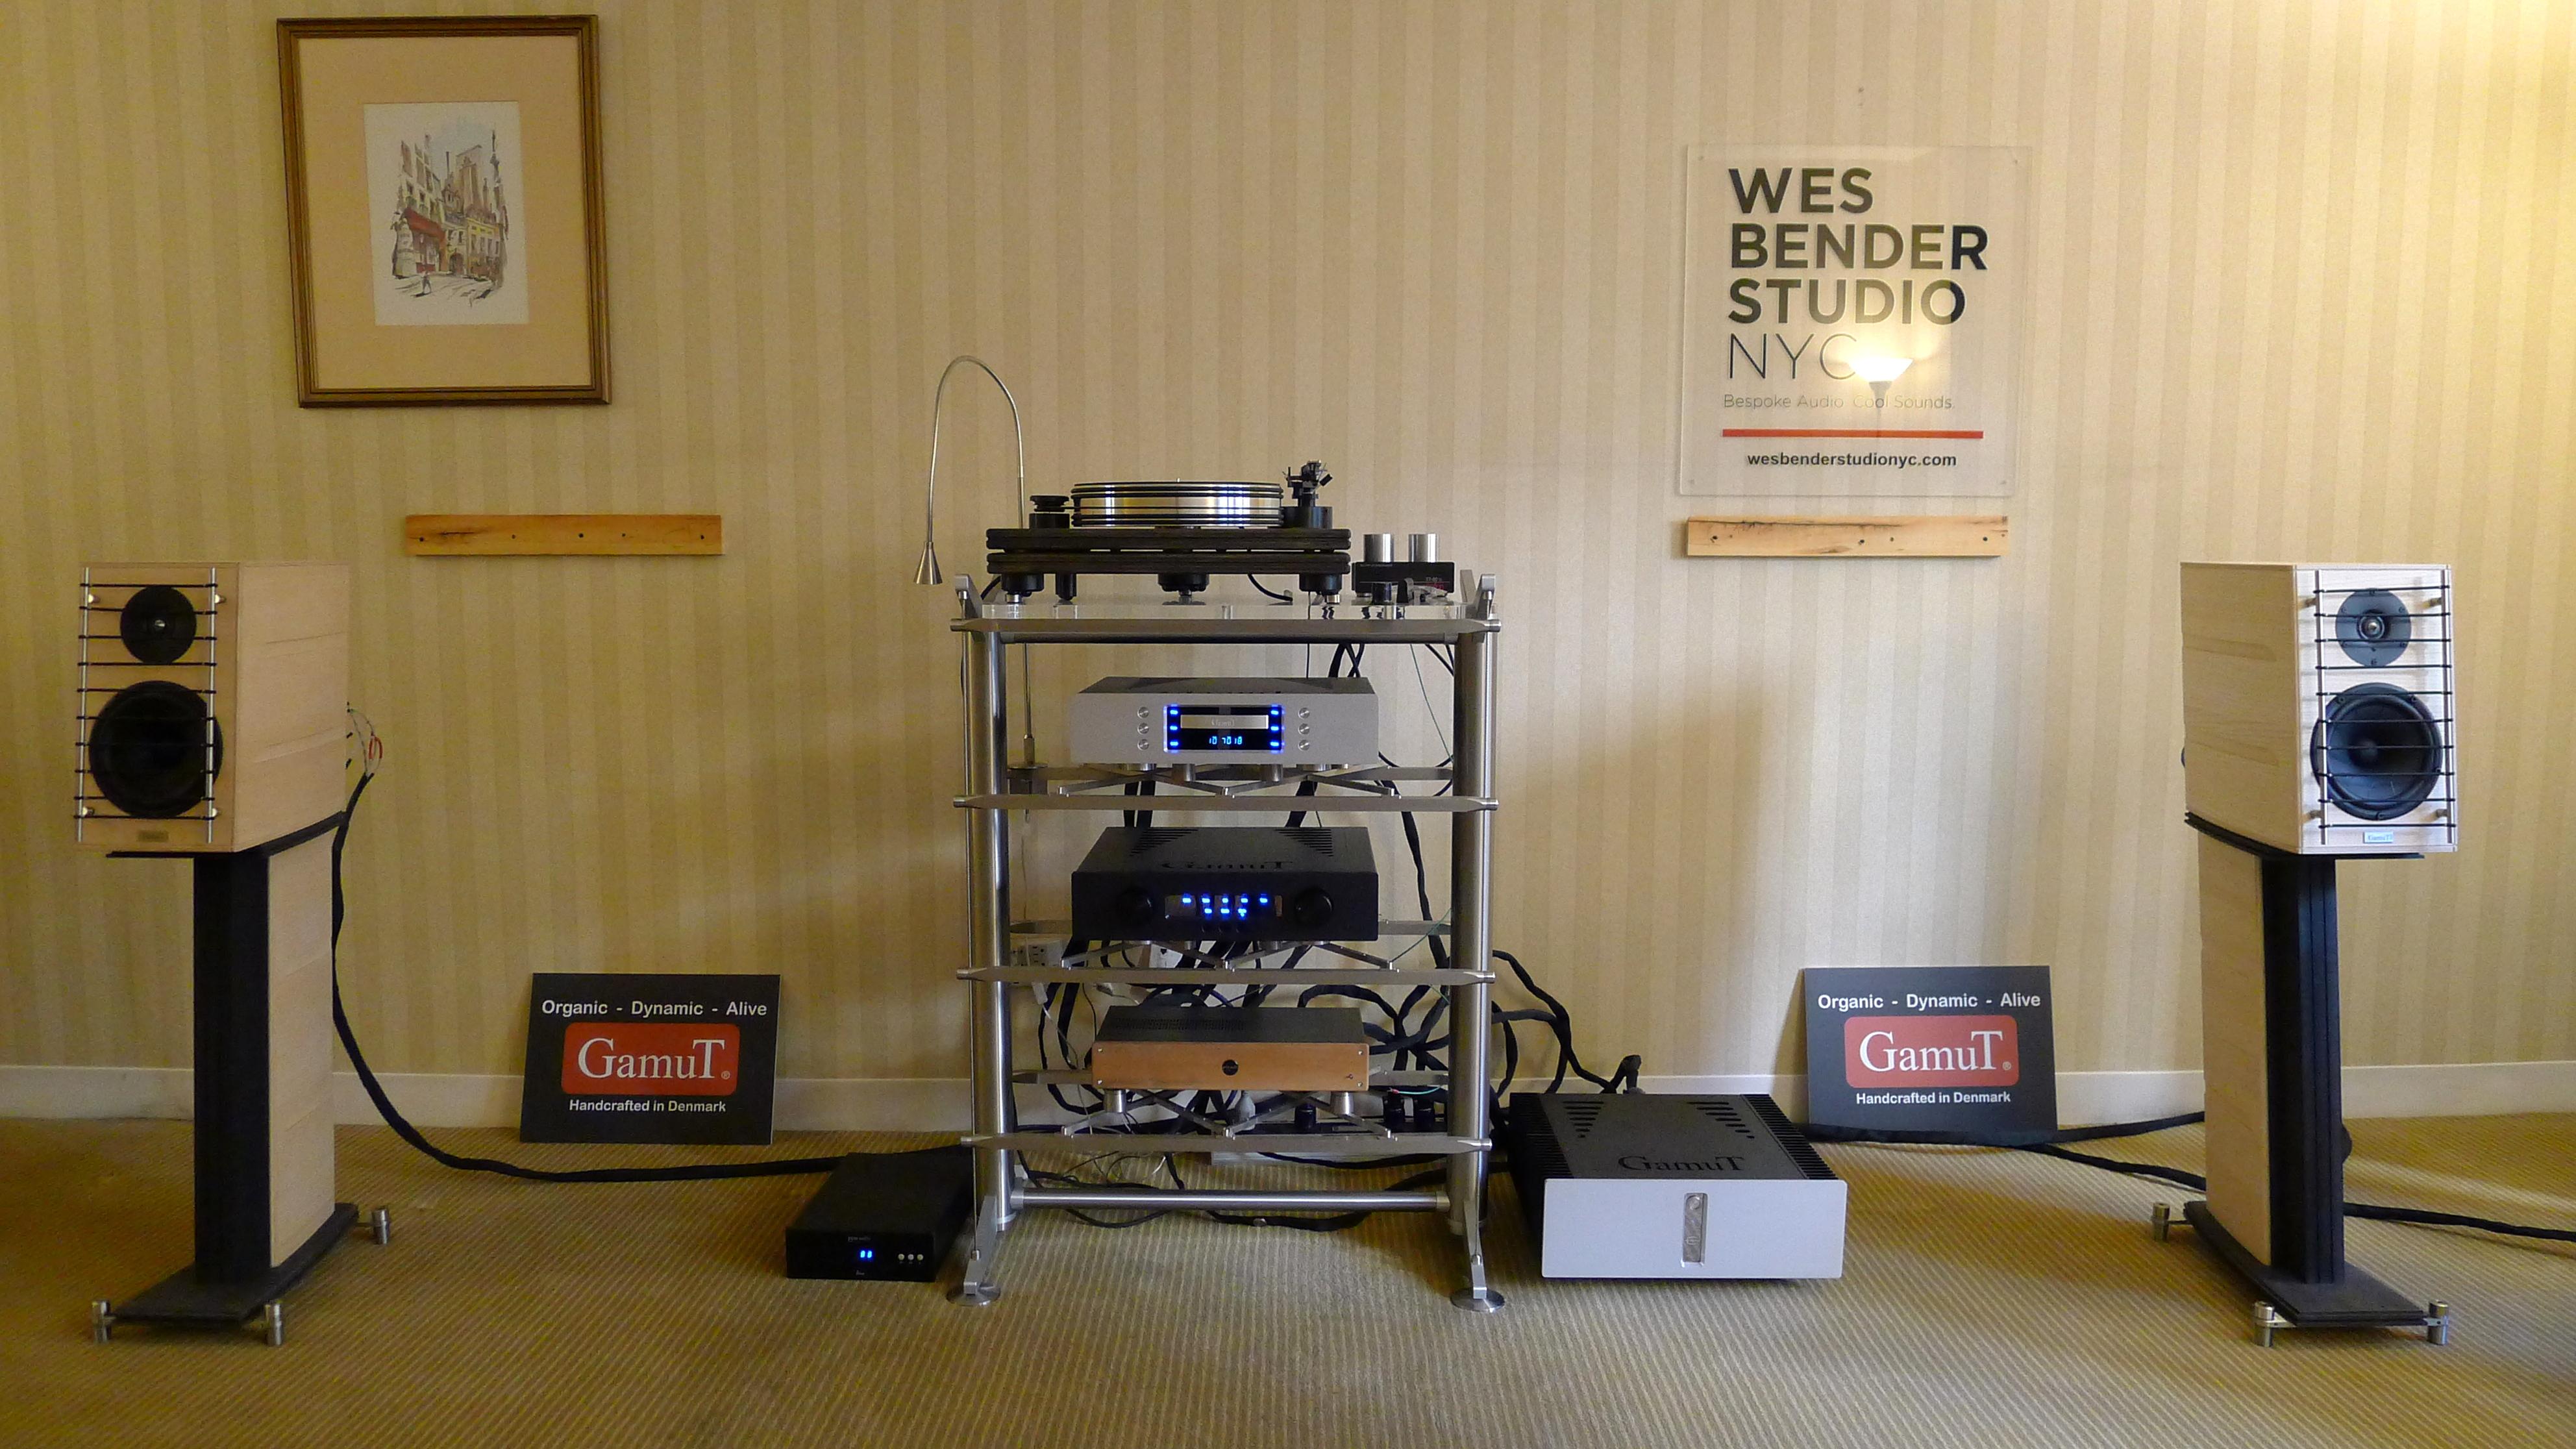 Wes Bender Studio